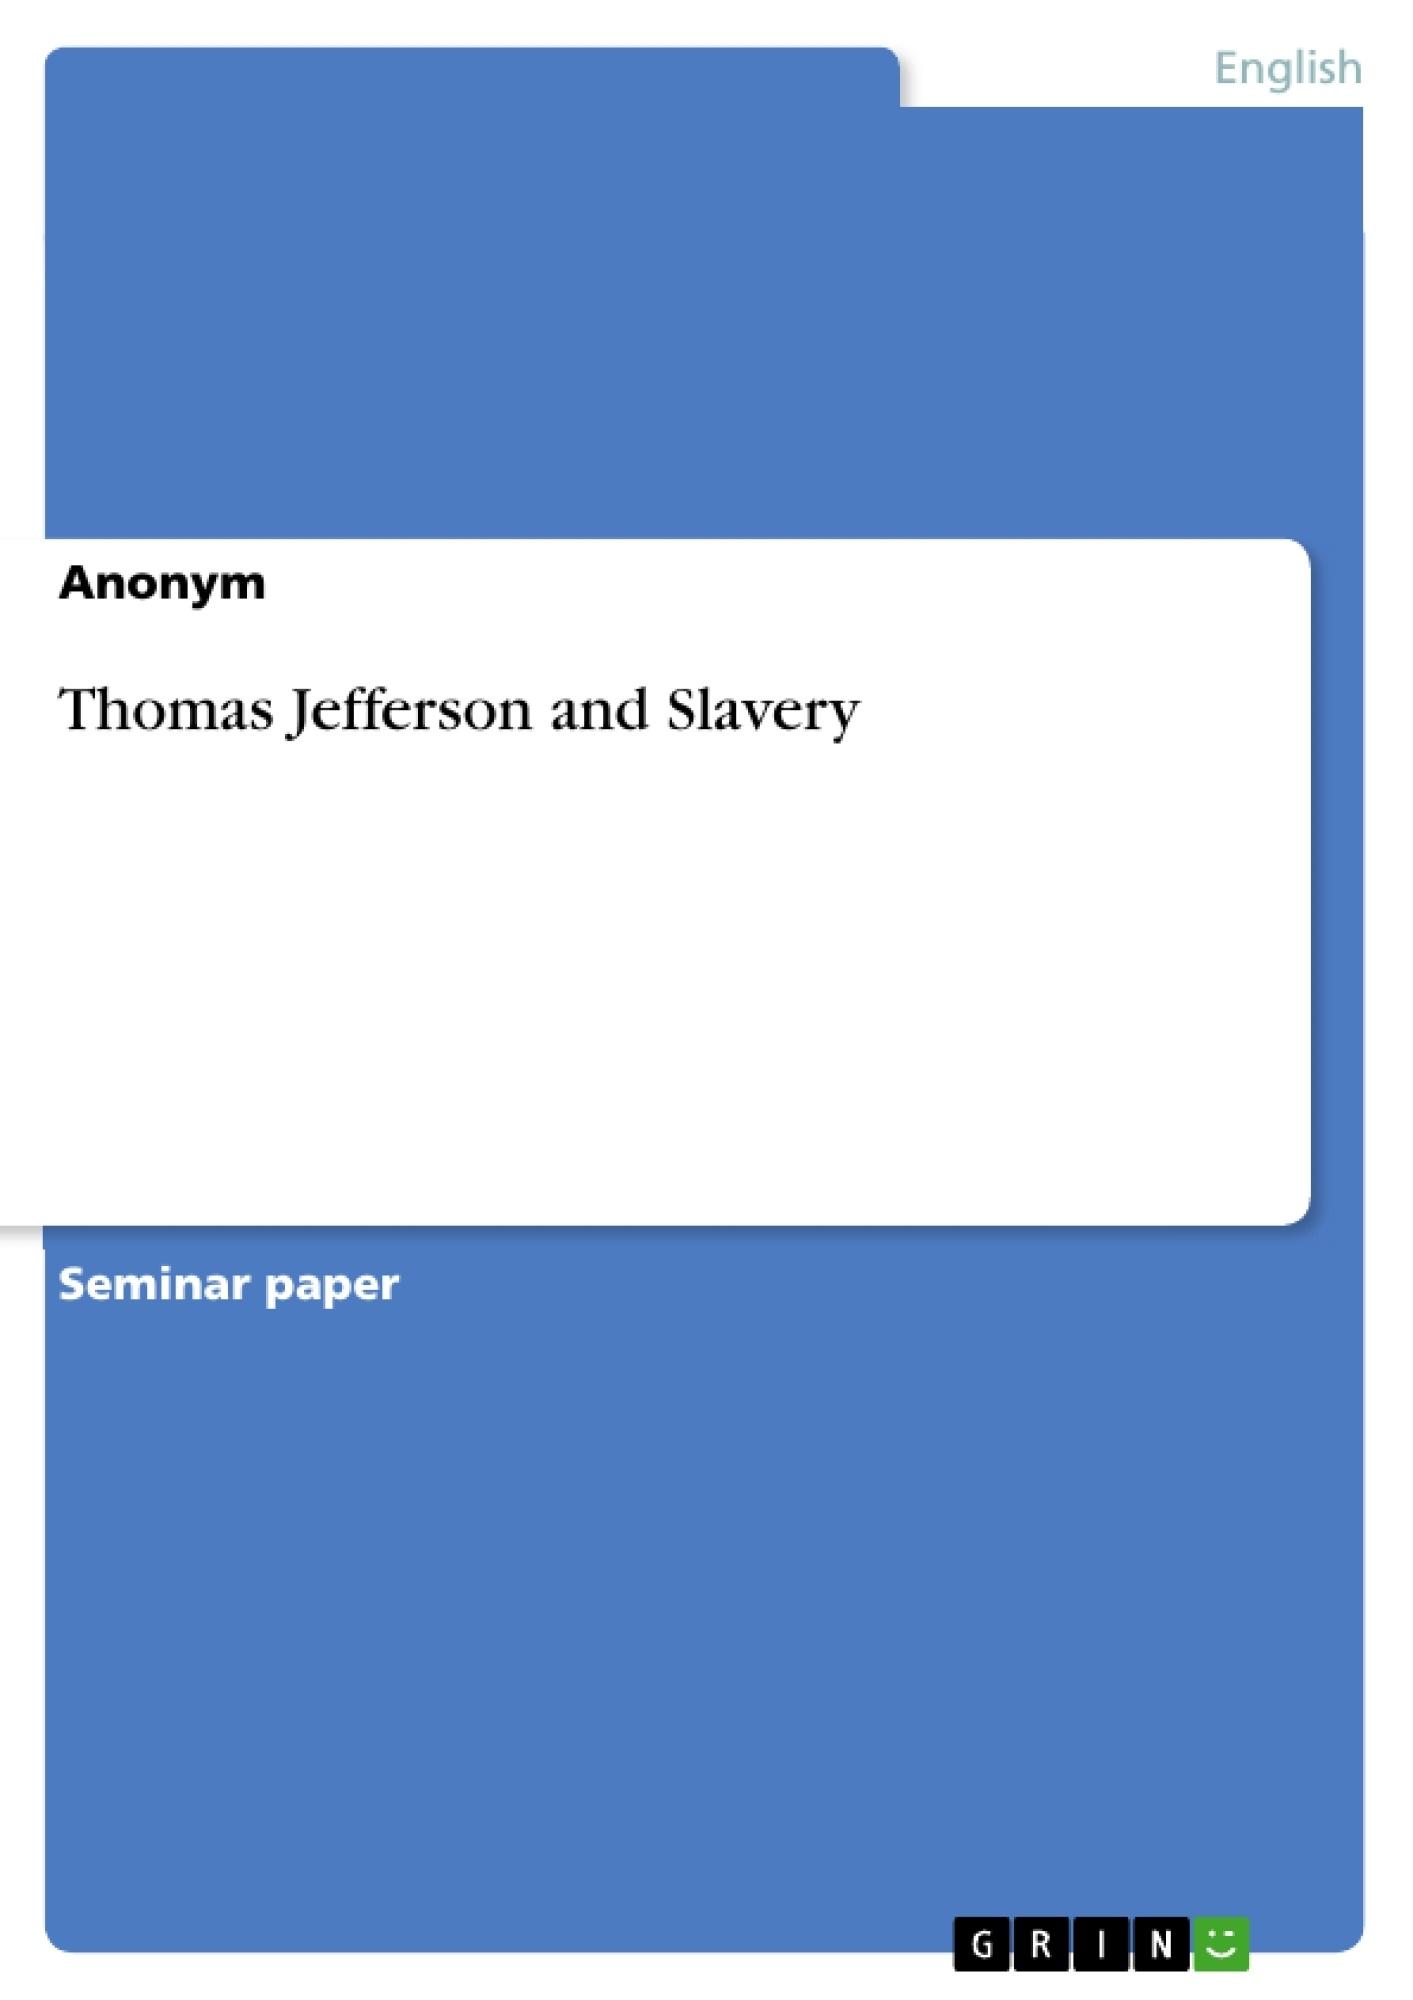 Title: Thomas Jefferson and Slavery